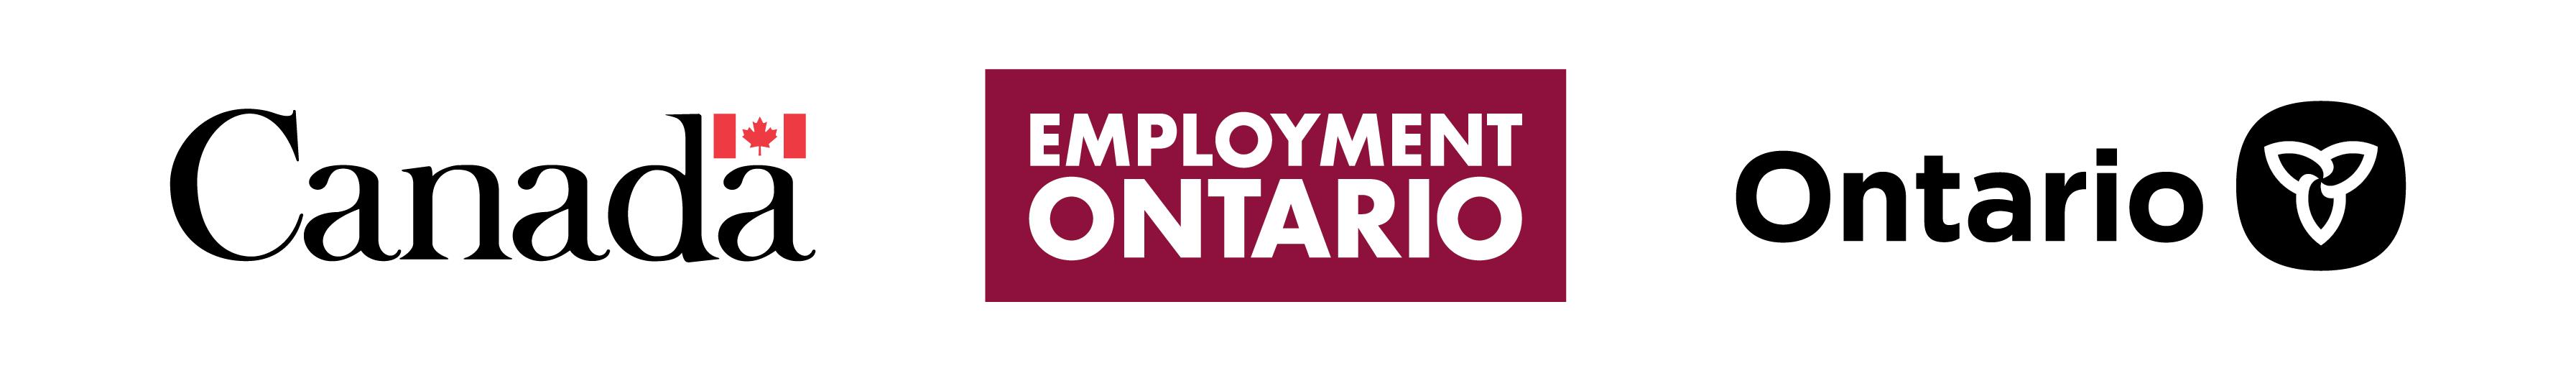 Employment Ontario Tri-Wordmark